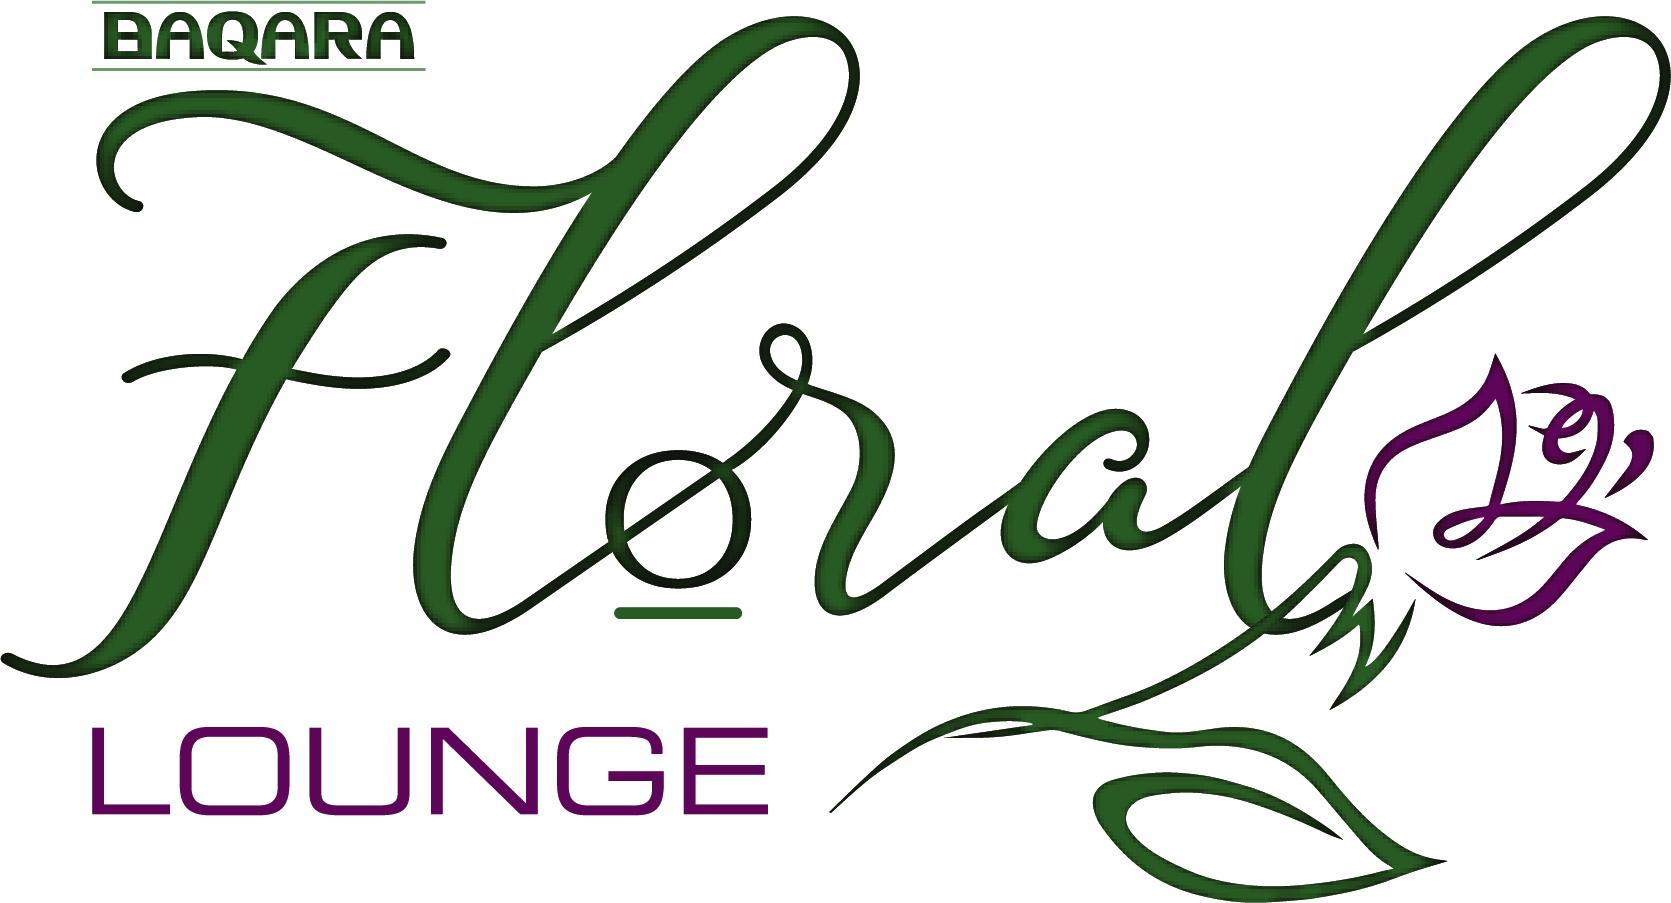 BAQARA- Floral LOUNGE Logo outlined.jpg